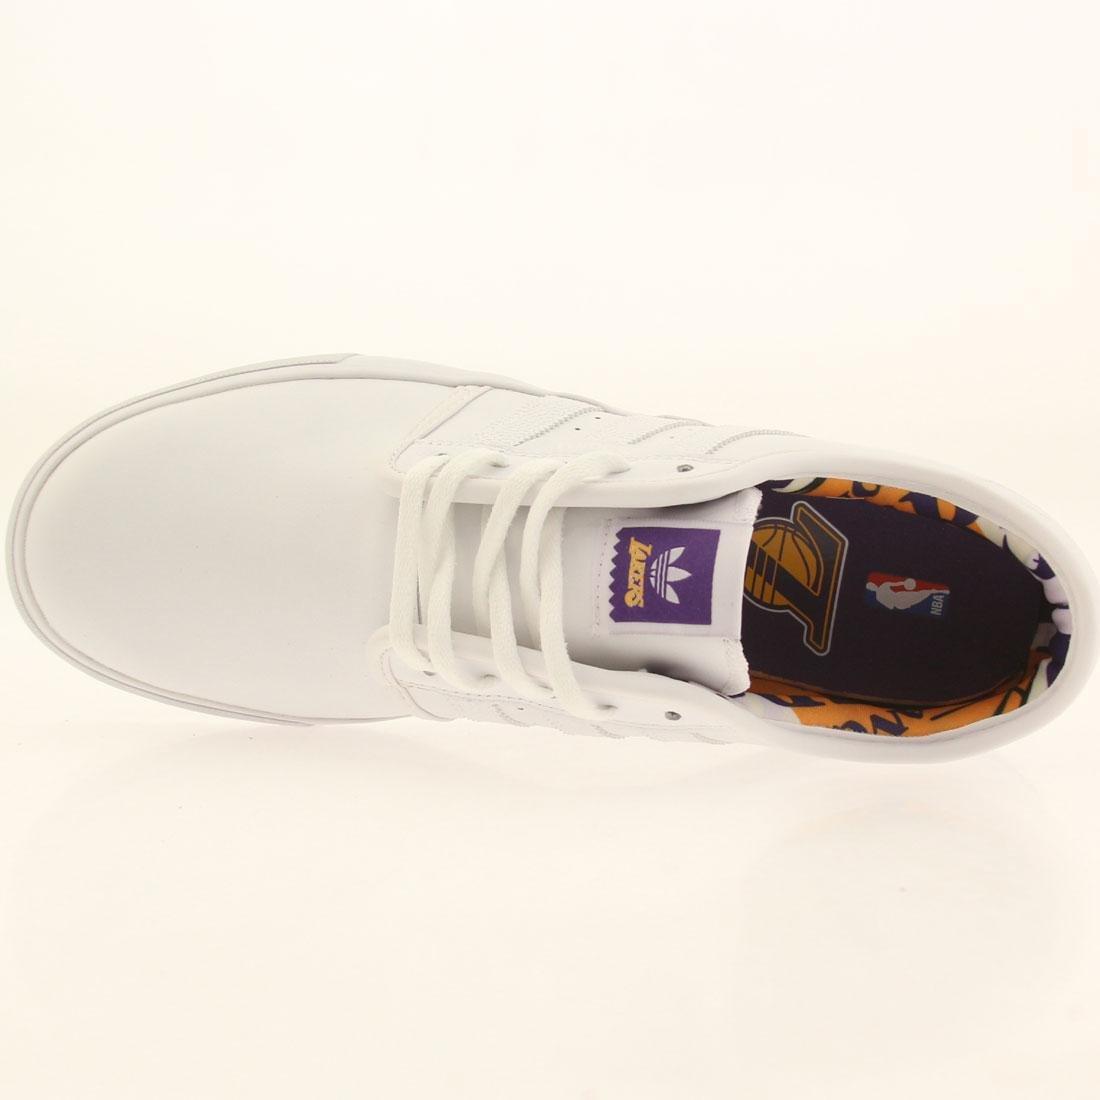 adidas skateboard uomini seeley nba bianco / oro / regale viola